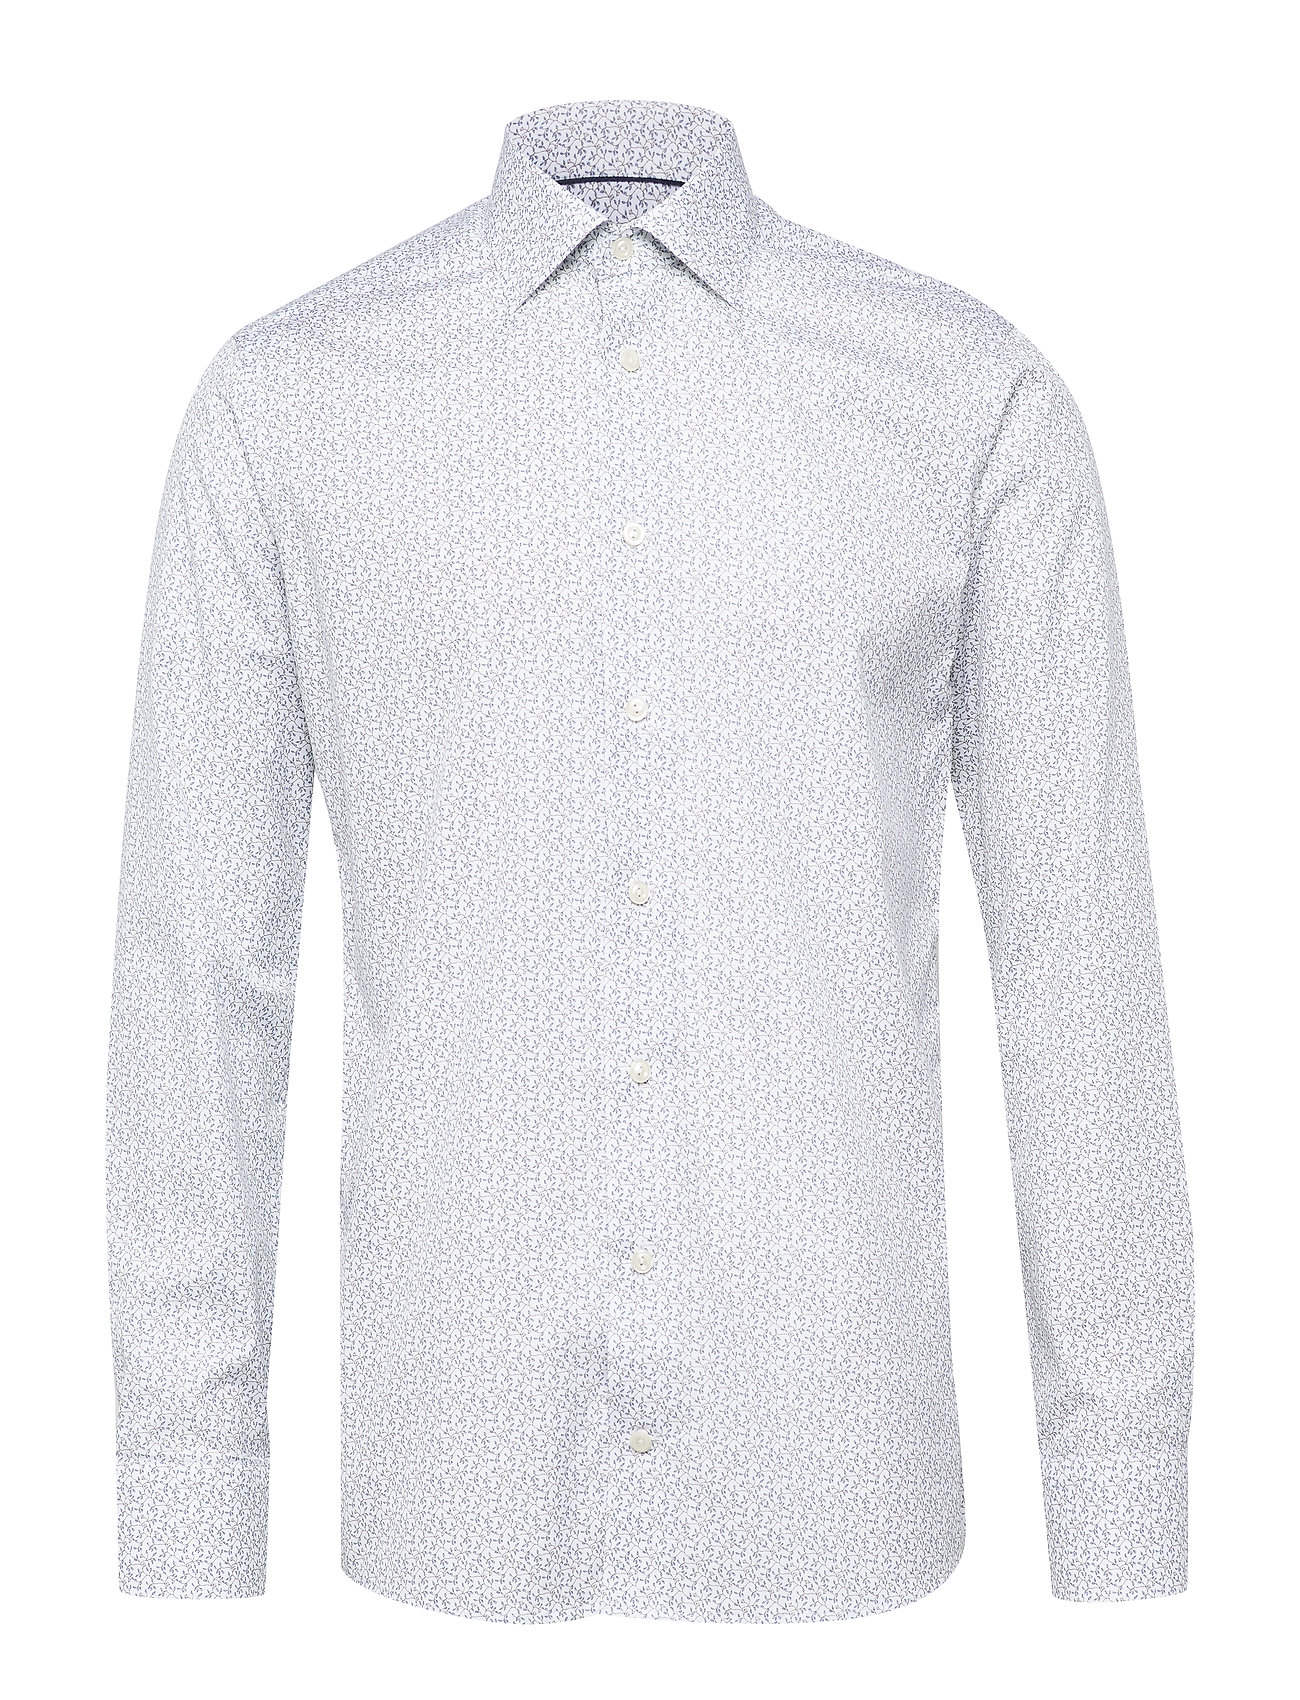 Eton Floral Poplin Shirt - WHITE